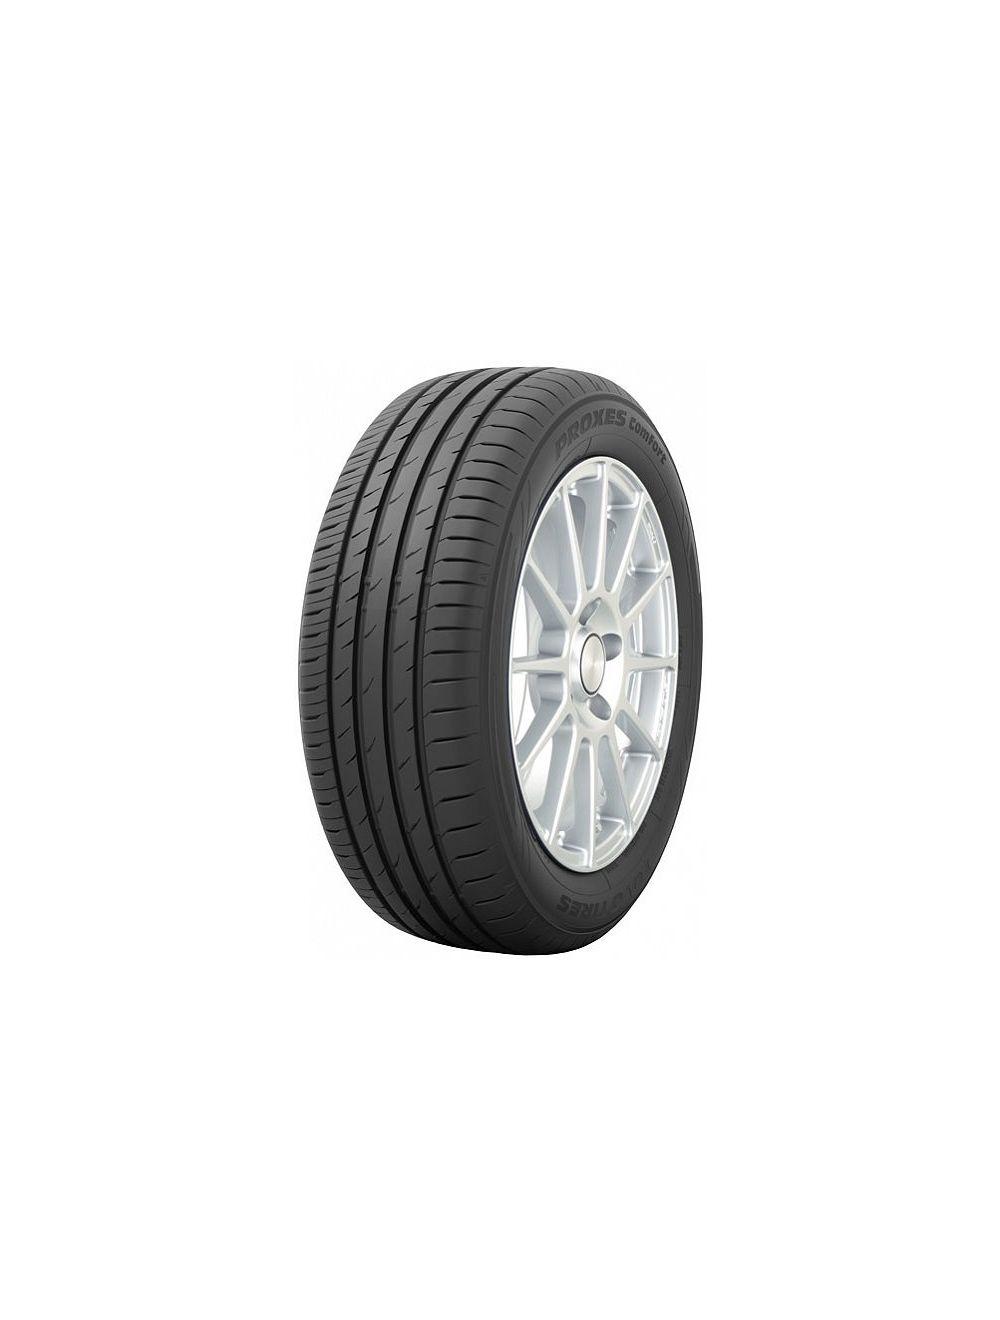 Toyo 225/40R18 W Proxes Comfort XL Nyári gumi